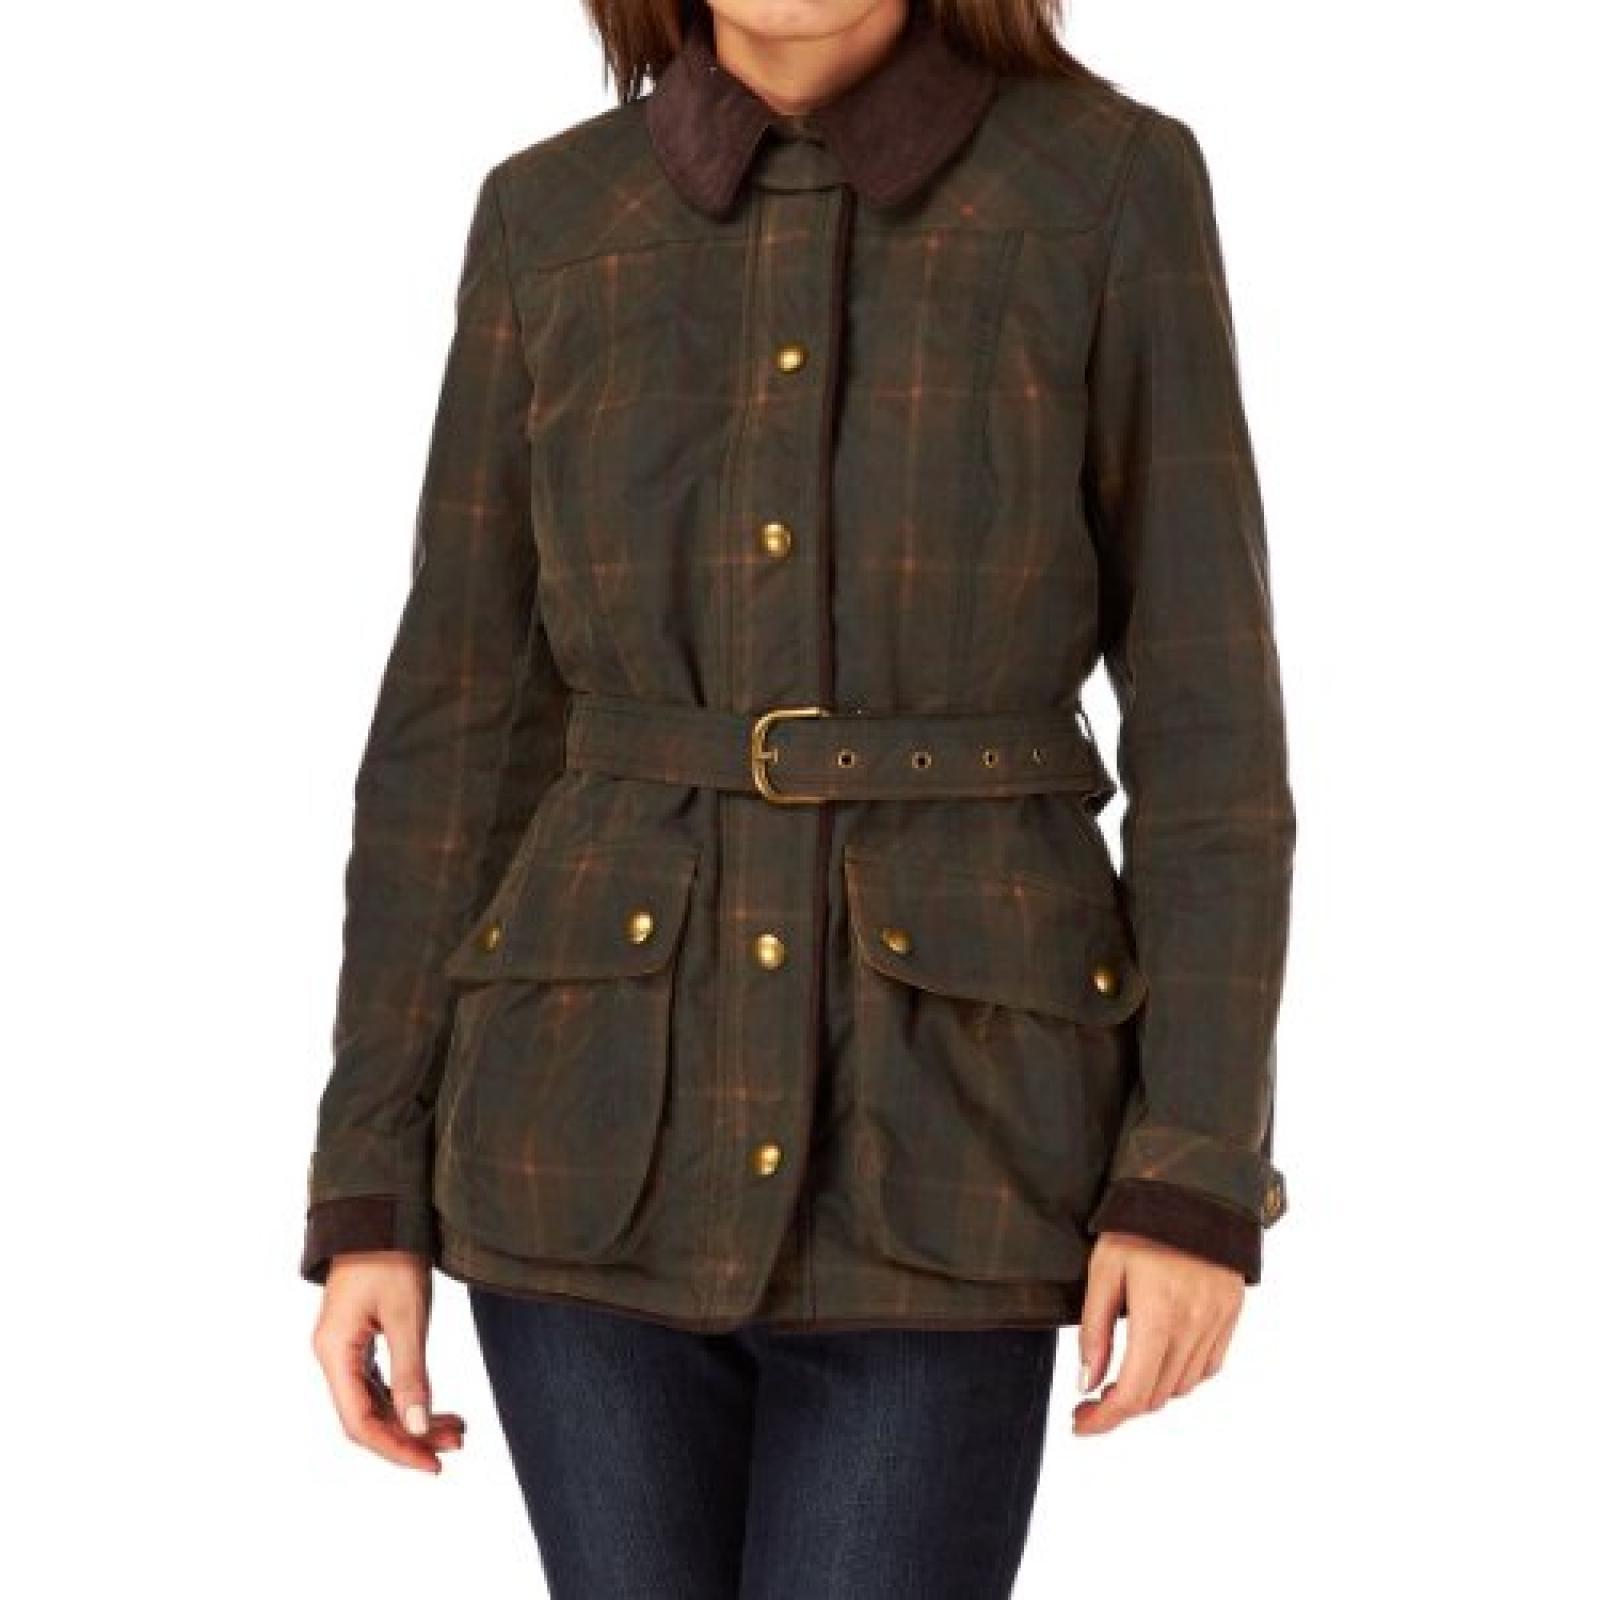 Joules Ladies? Milbury Check Wax Jacket ? Brown Check P_MILBURYCHK